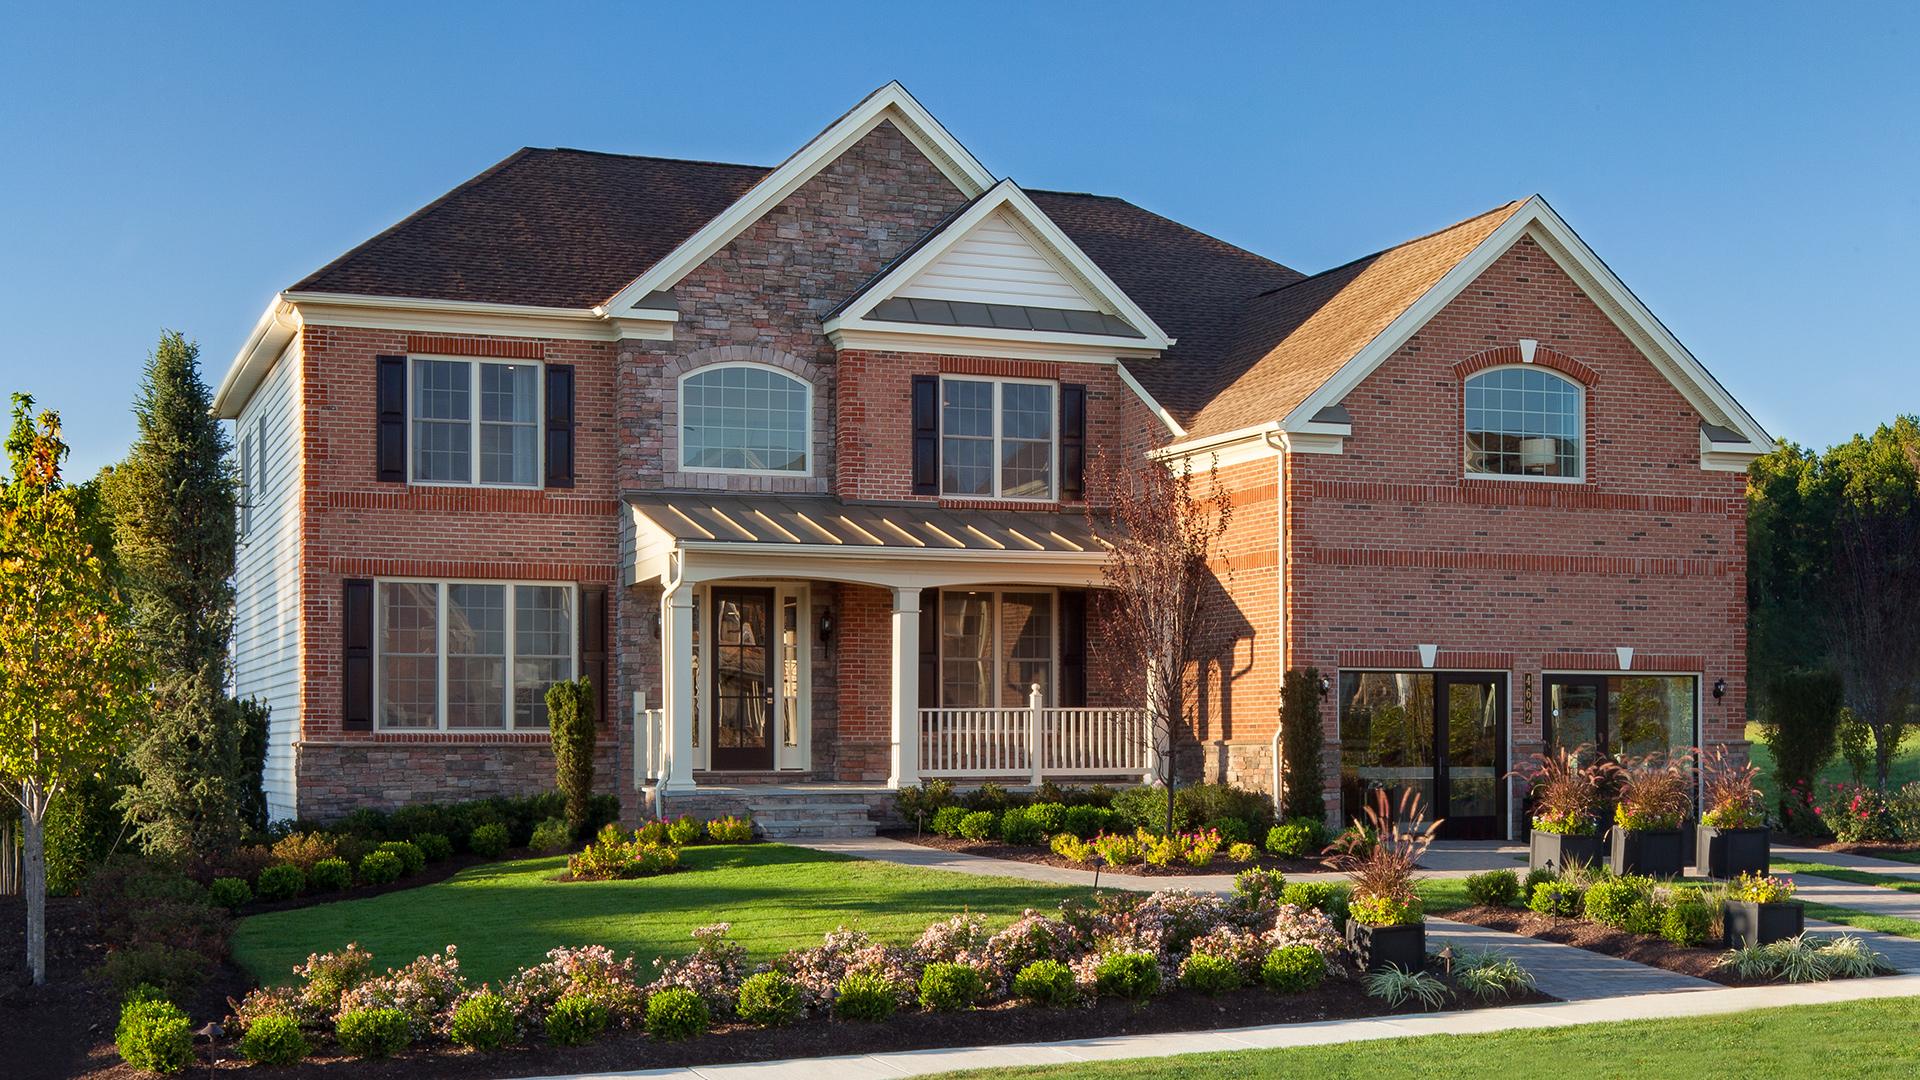 Upper Marlboro MD New Homes for Sale | Marlboro Ridge - The Hunt